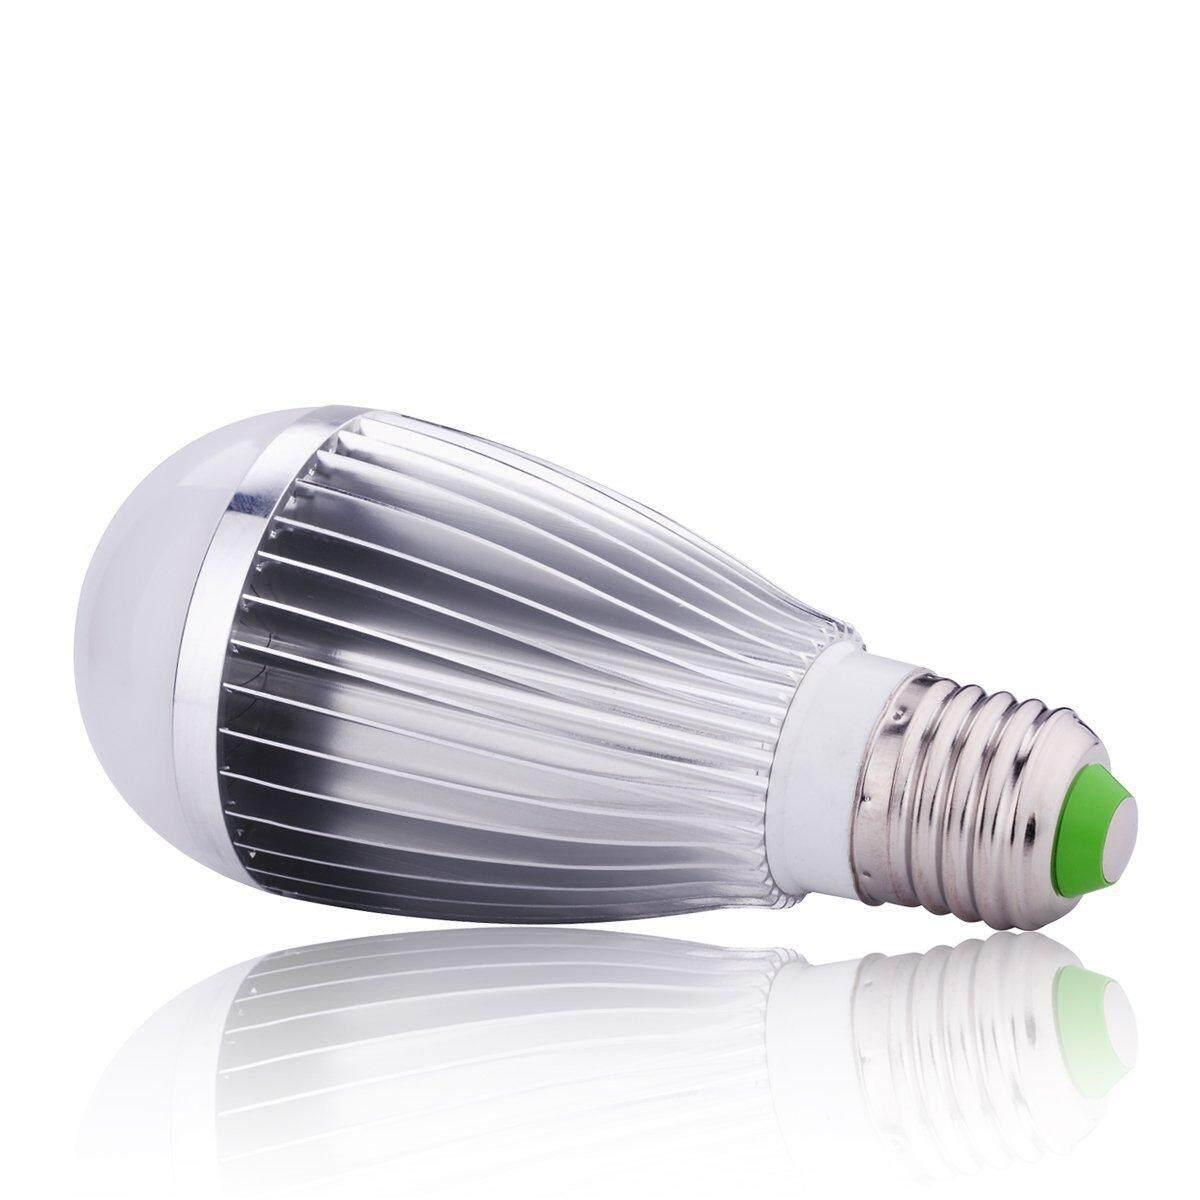 Buy Sell Cheapest 21w Ac 230v Best Quality Product Deals Ultra Bright Led Lamp For Ac230v Super 220v Smd Warm White Bulb Light